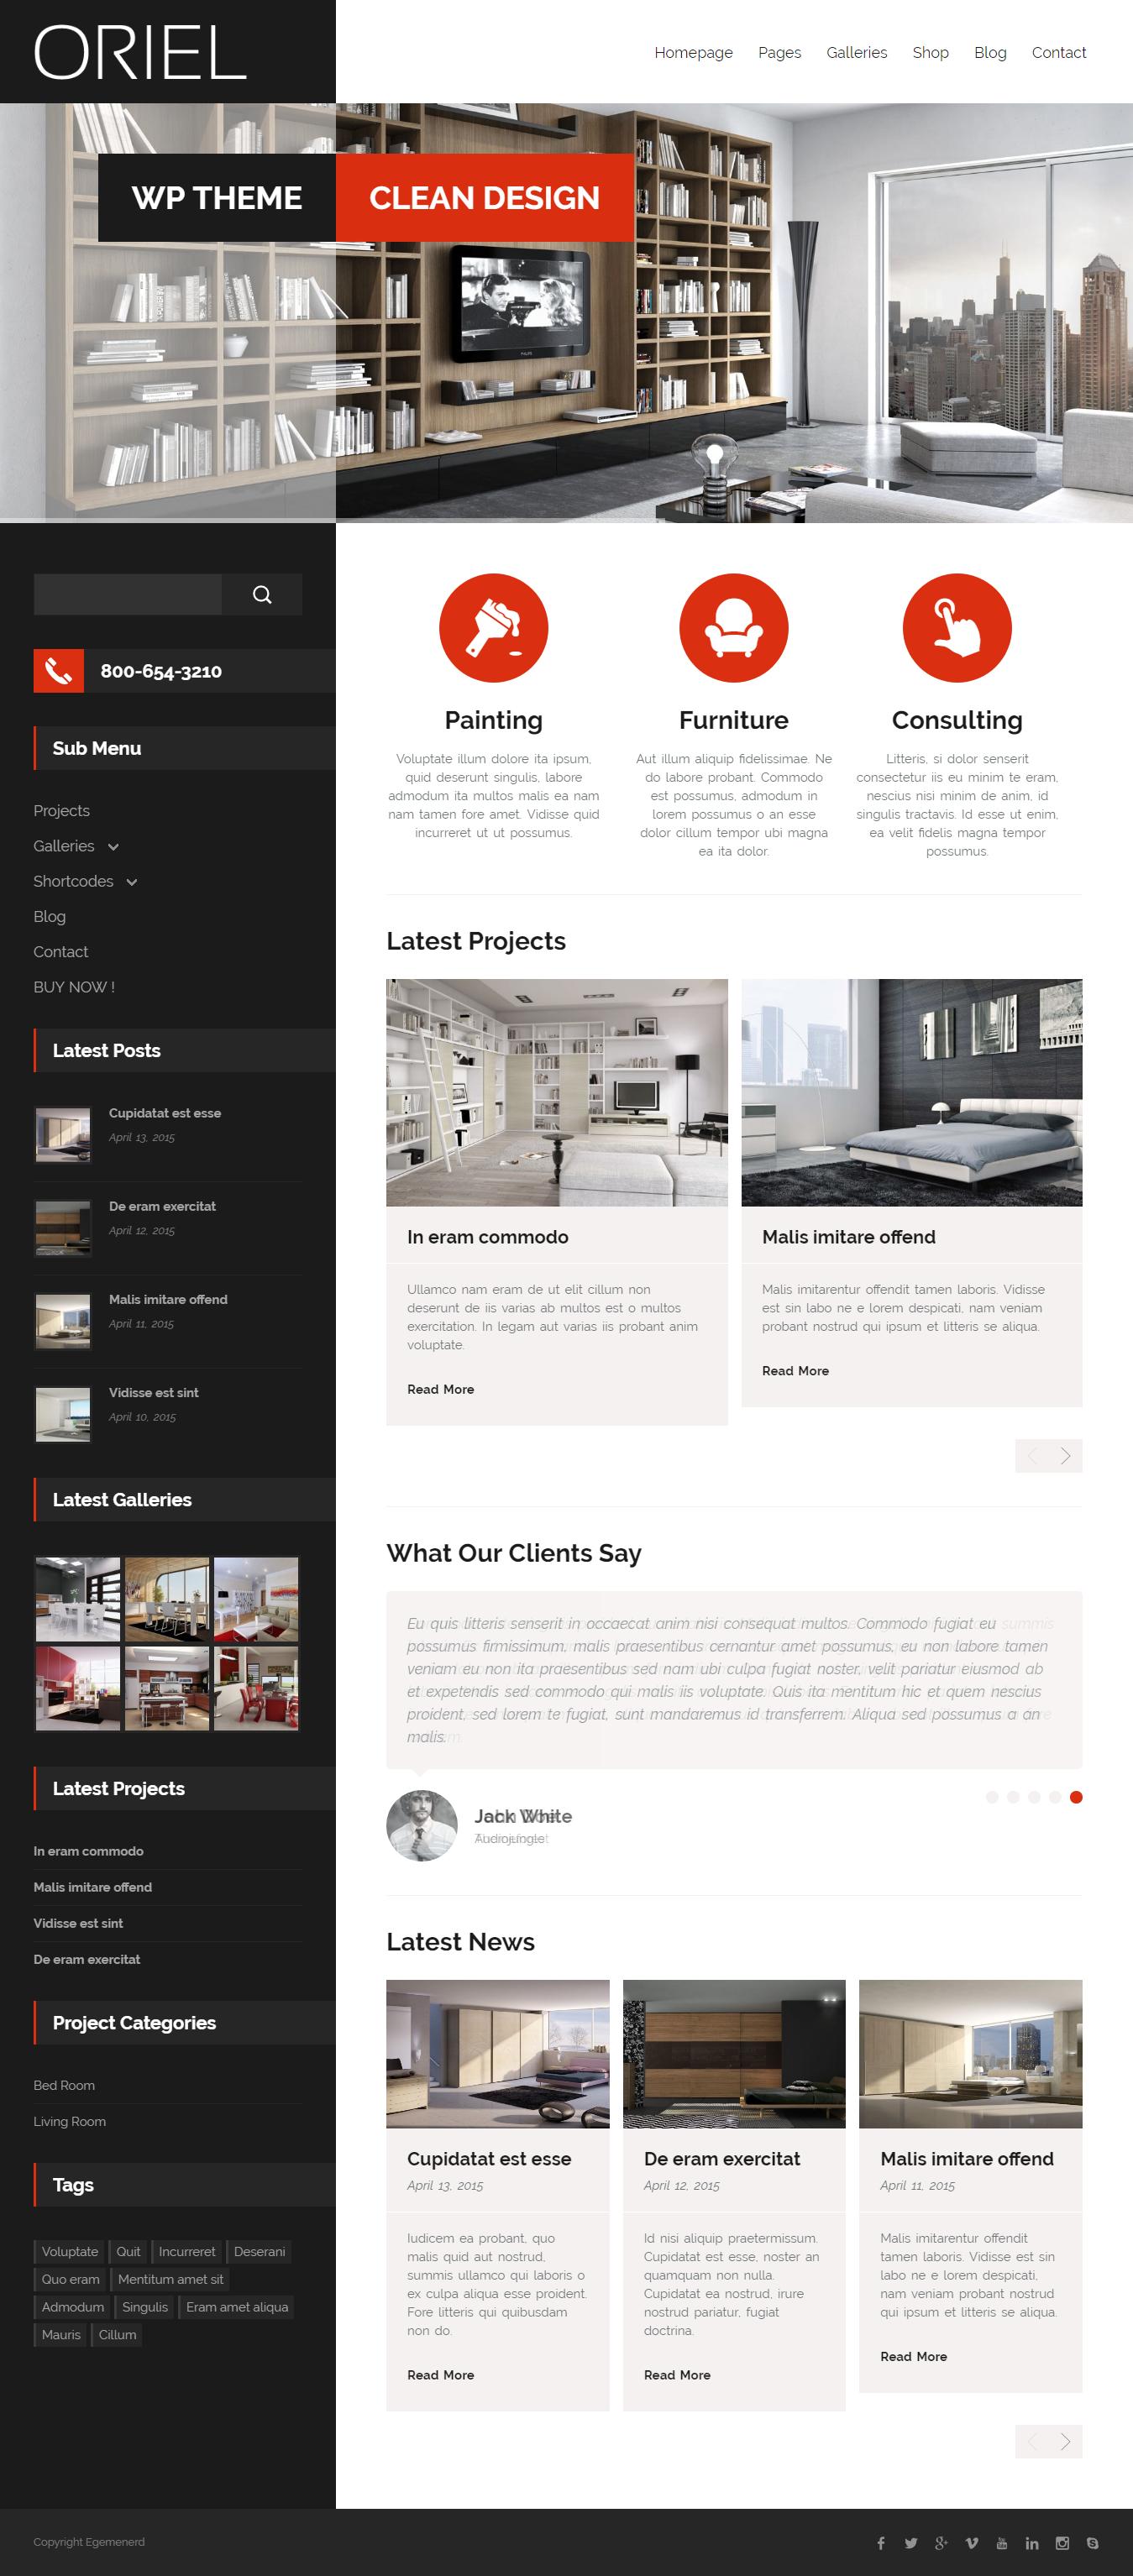 oriel best premium interior design wordpress theme - 10+ Best Premium Interior Design WordPress Themes